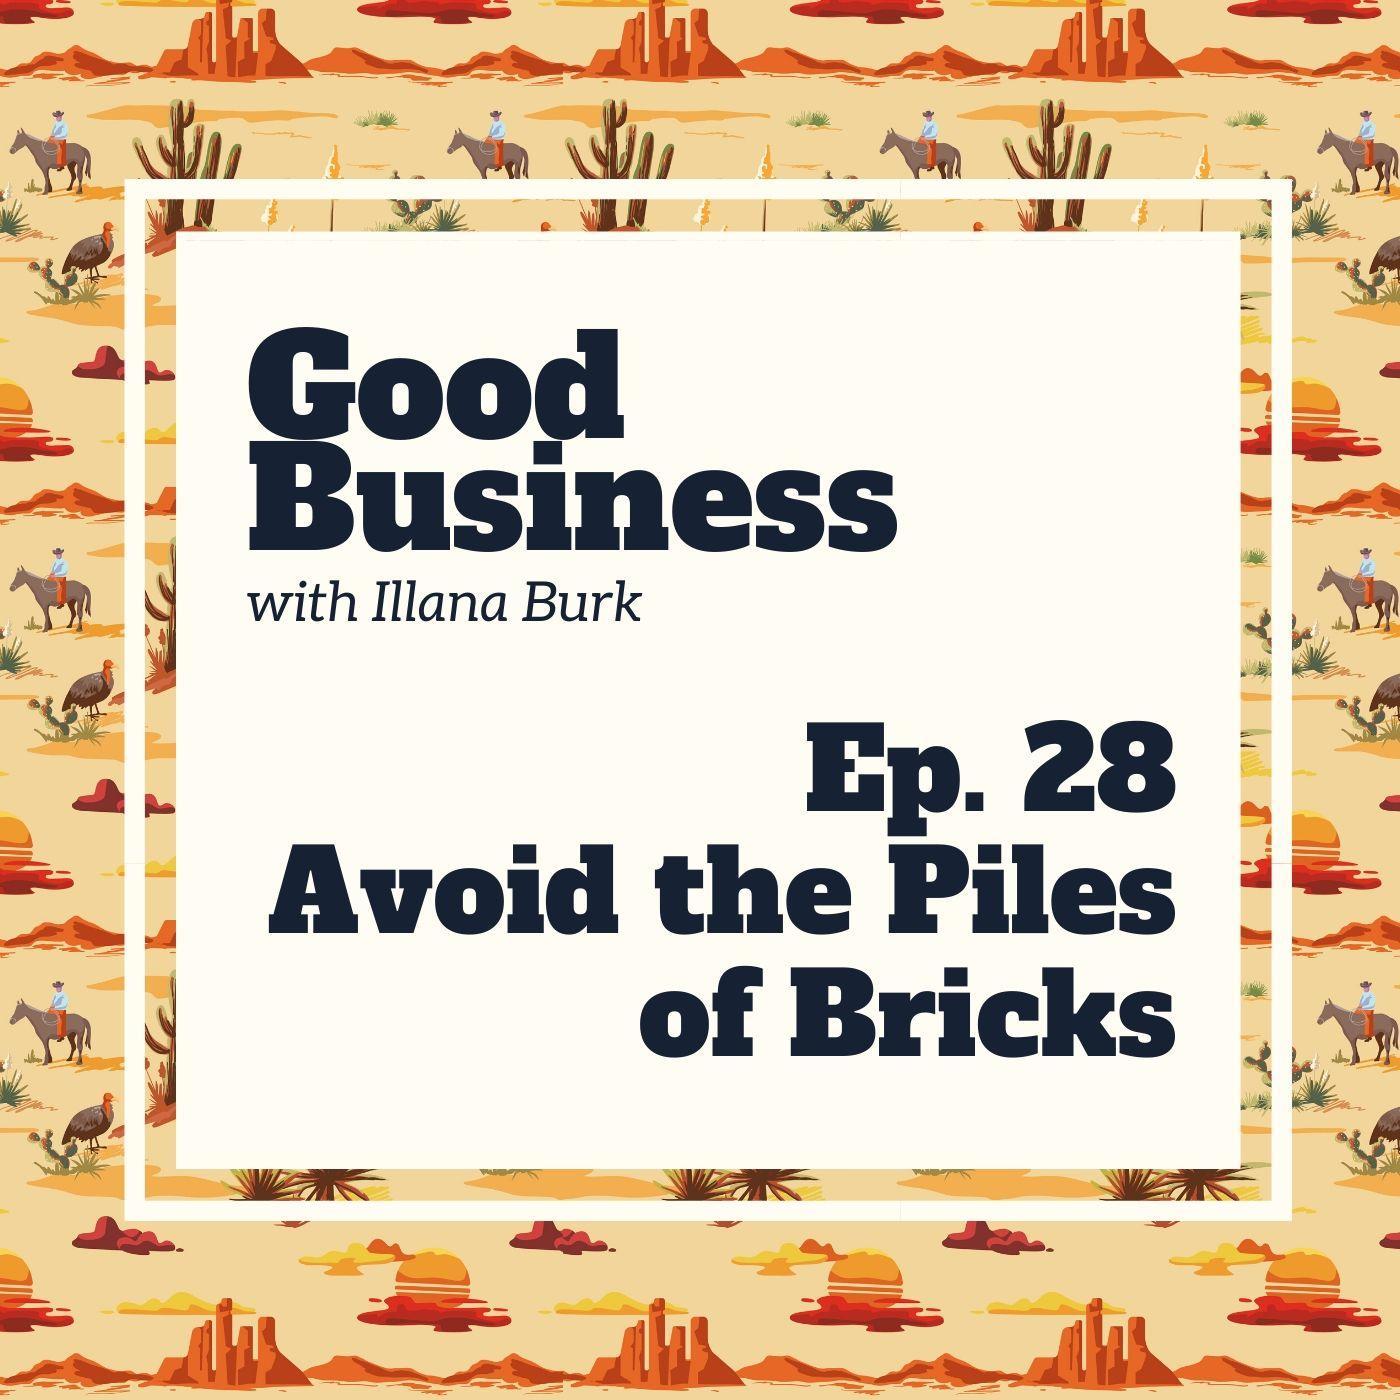 Avoid the piles of bricks. | GB28